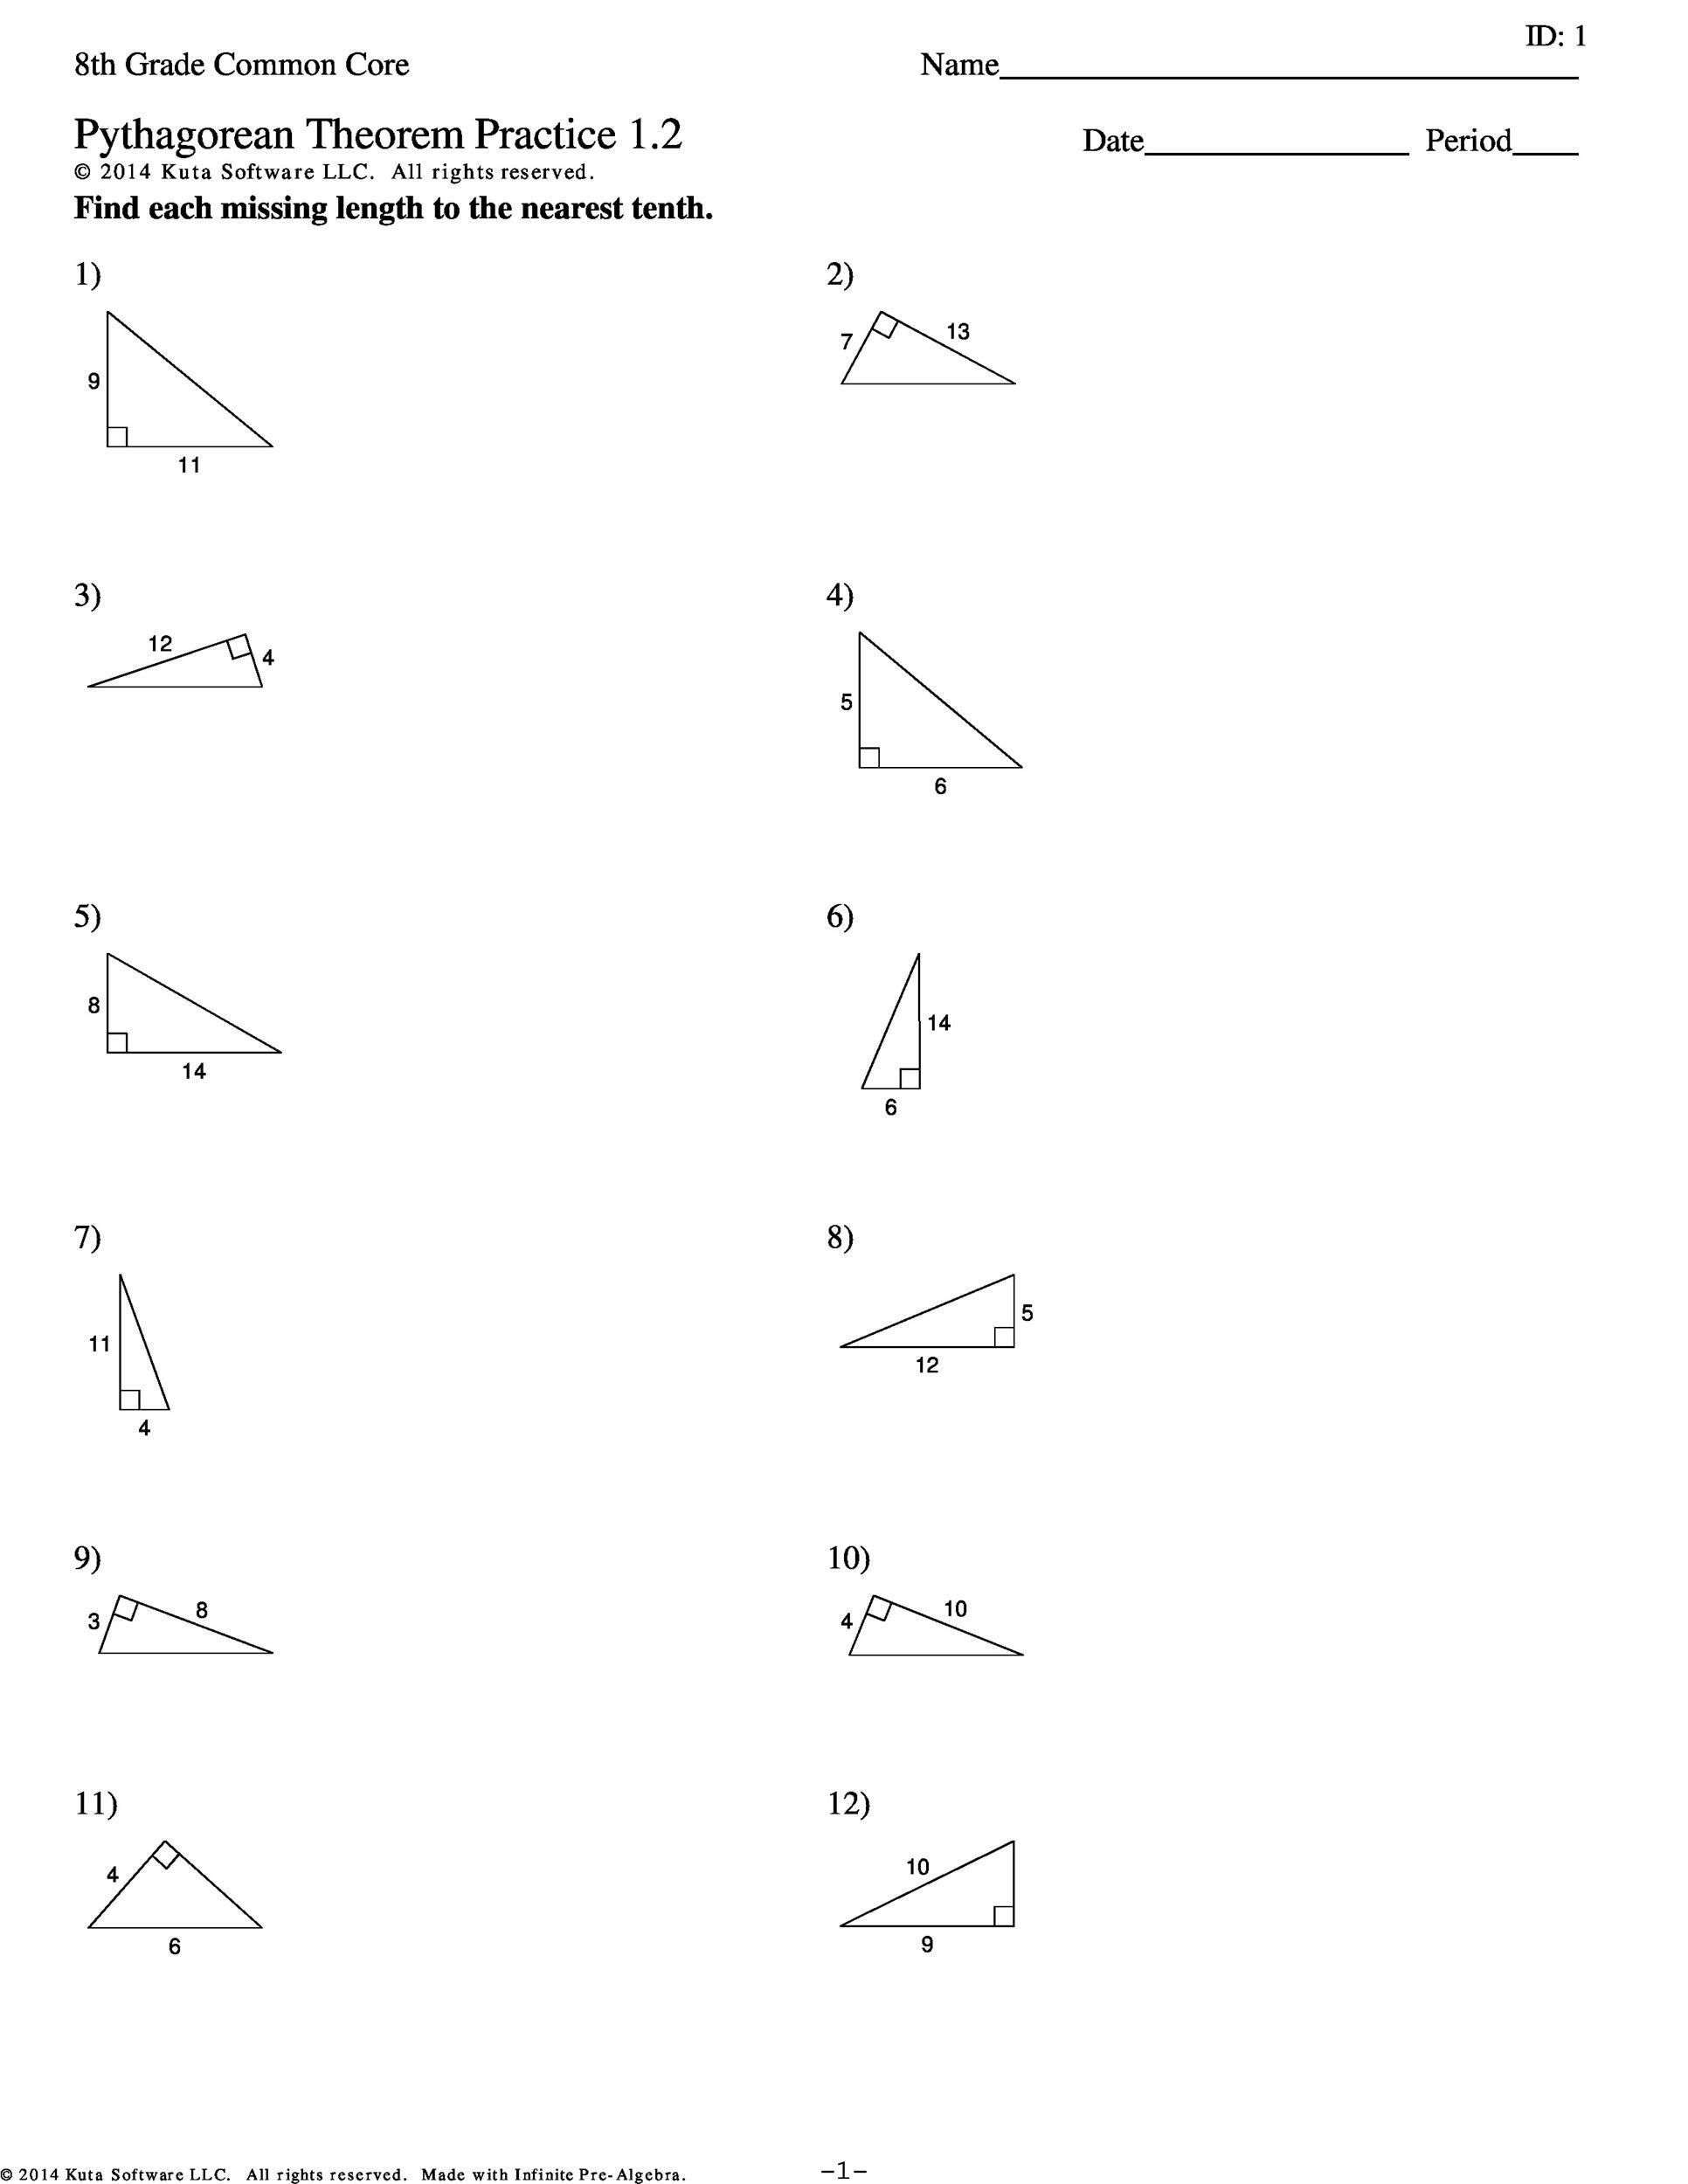 Free pythagorean theorem 15